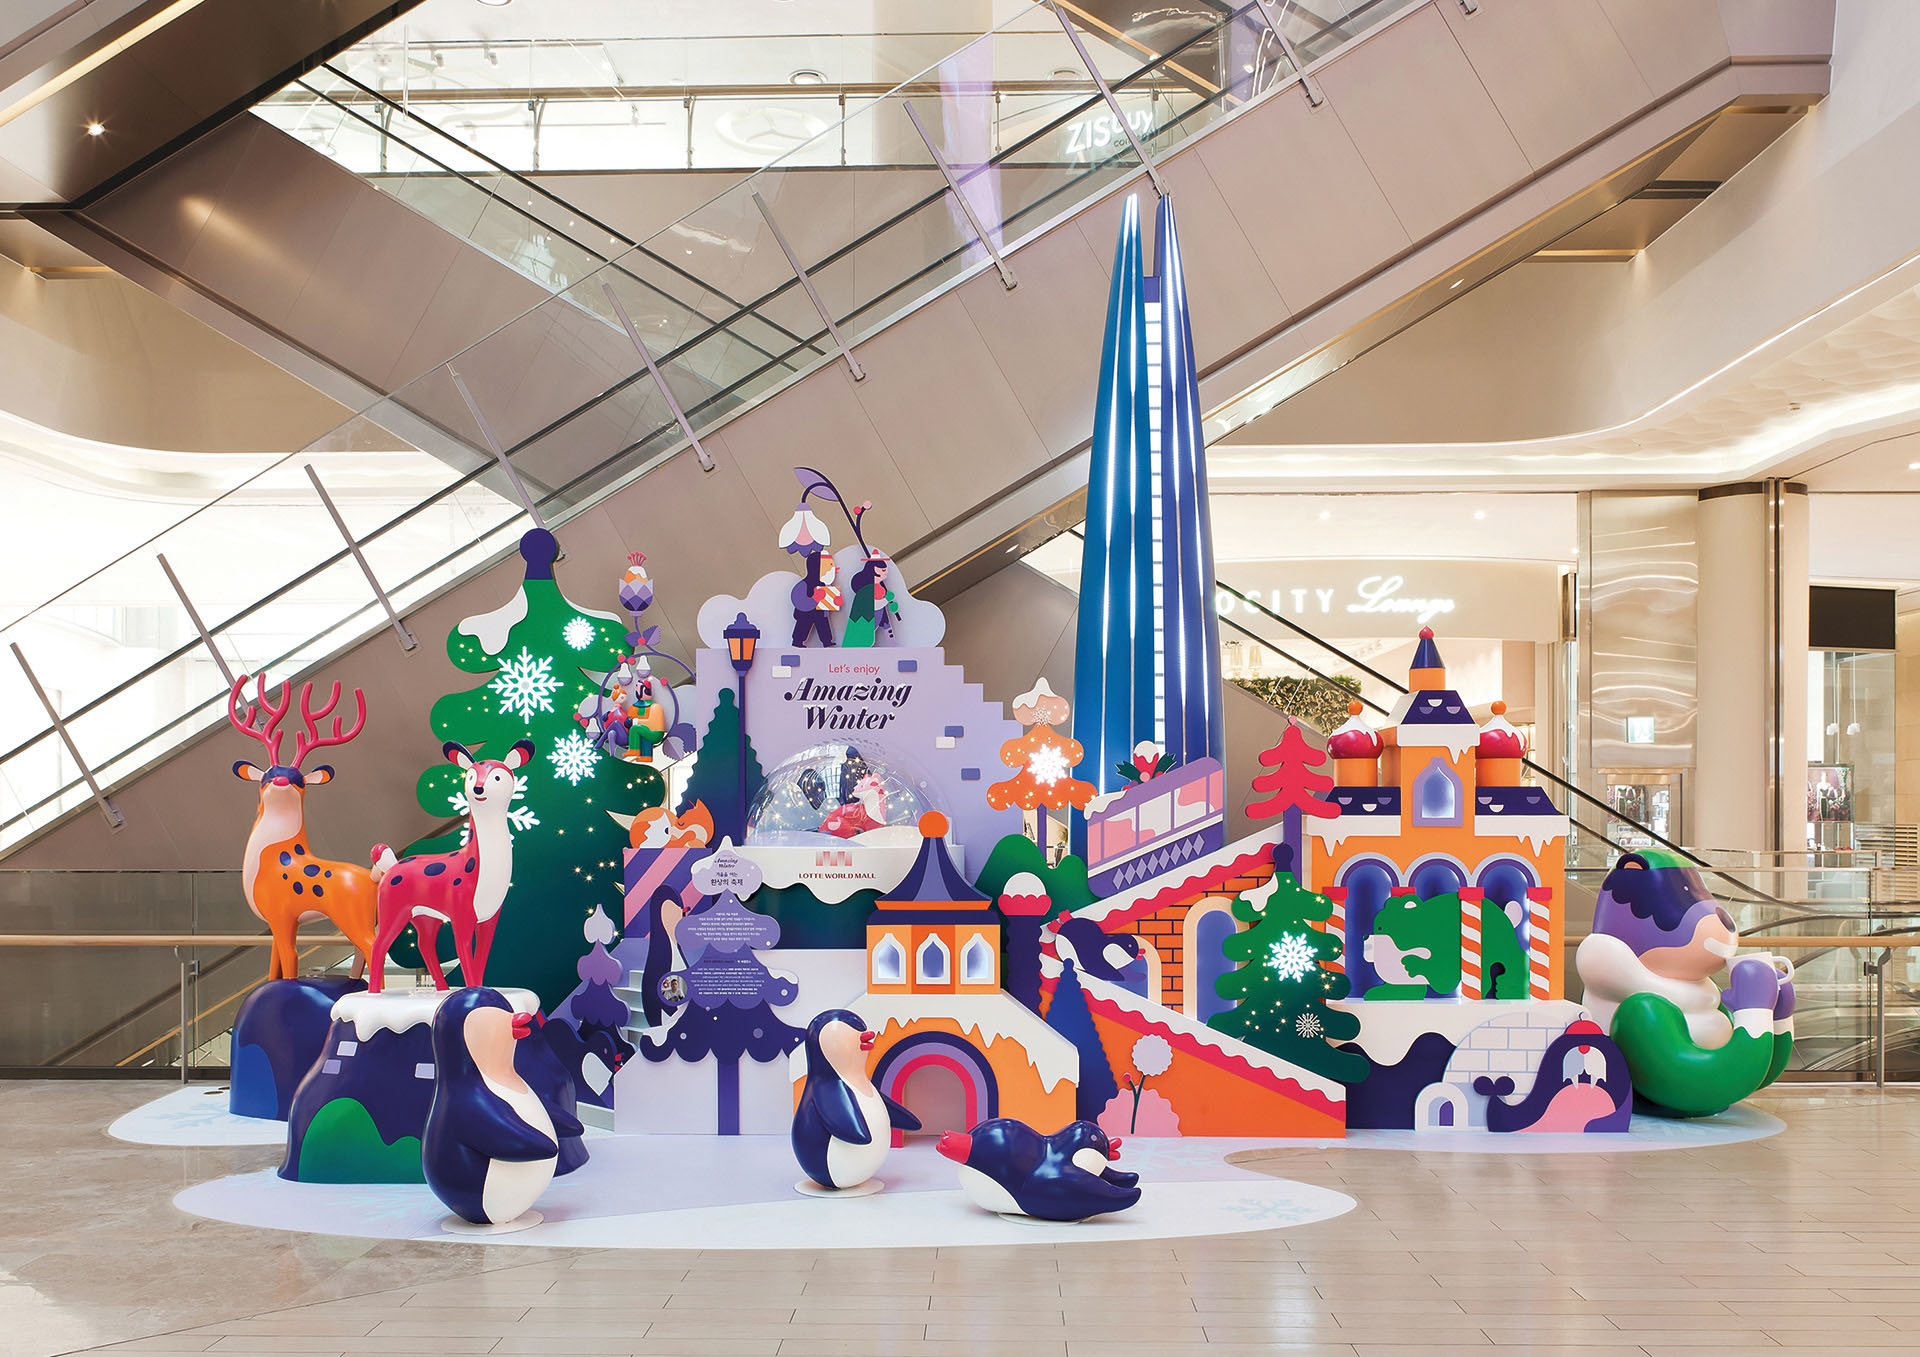 Hedof_Lotte World Mall_Image_2.jpg